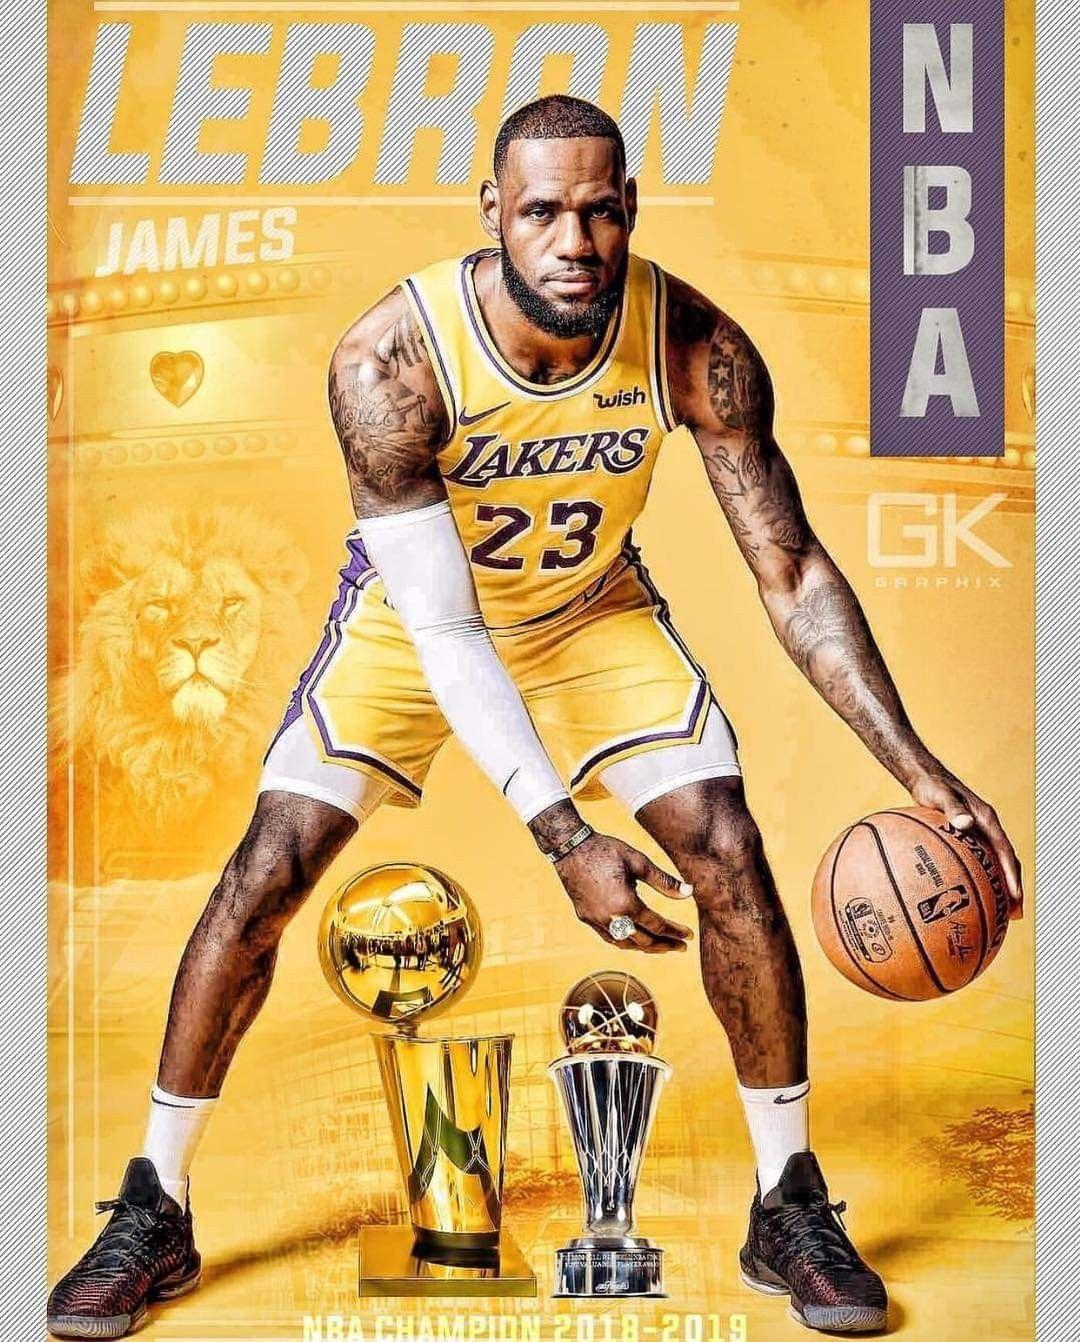 Lebron James Wallpaper Lebron James Wallpapers Lebron James Lakers Nba Lebron James